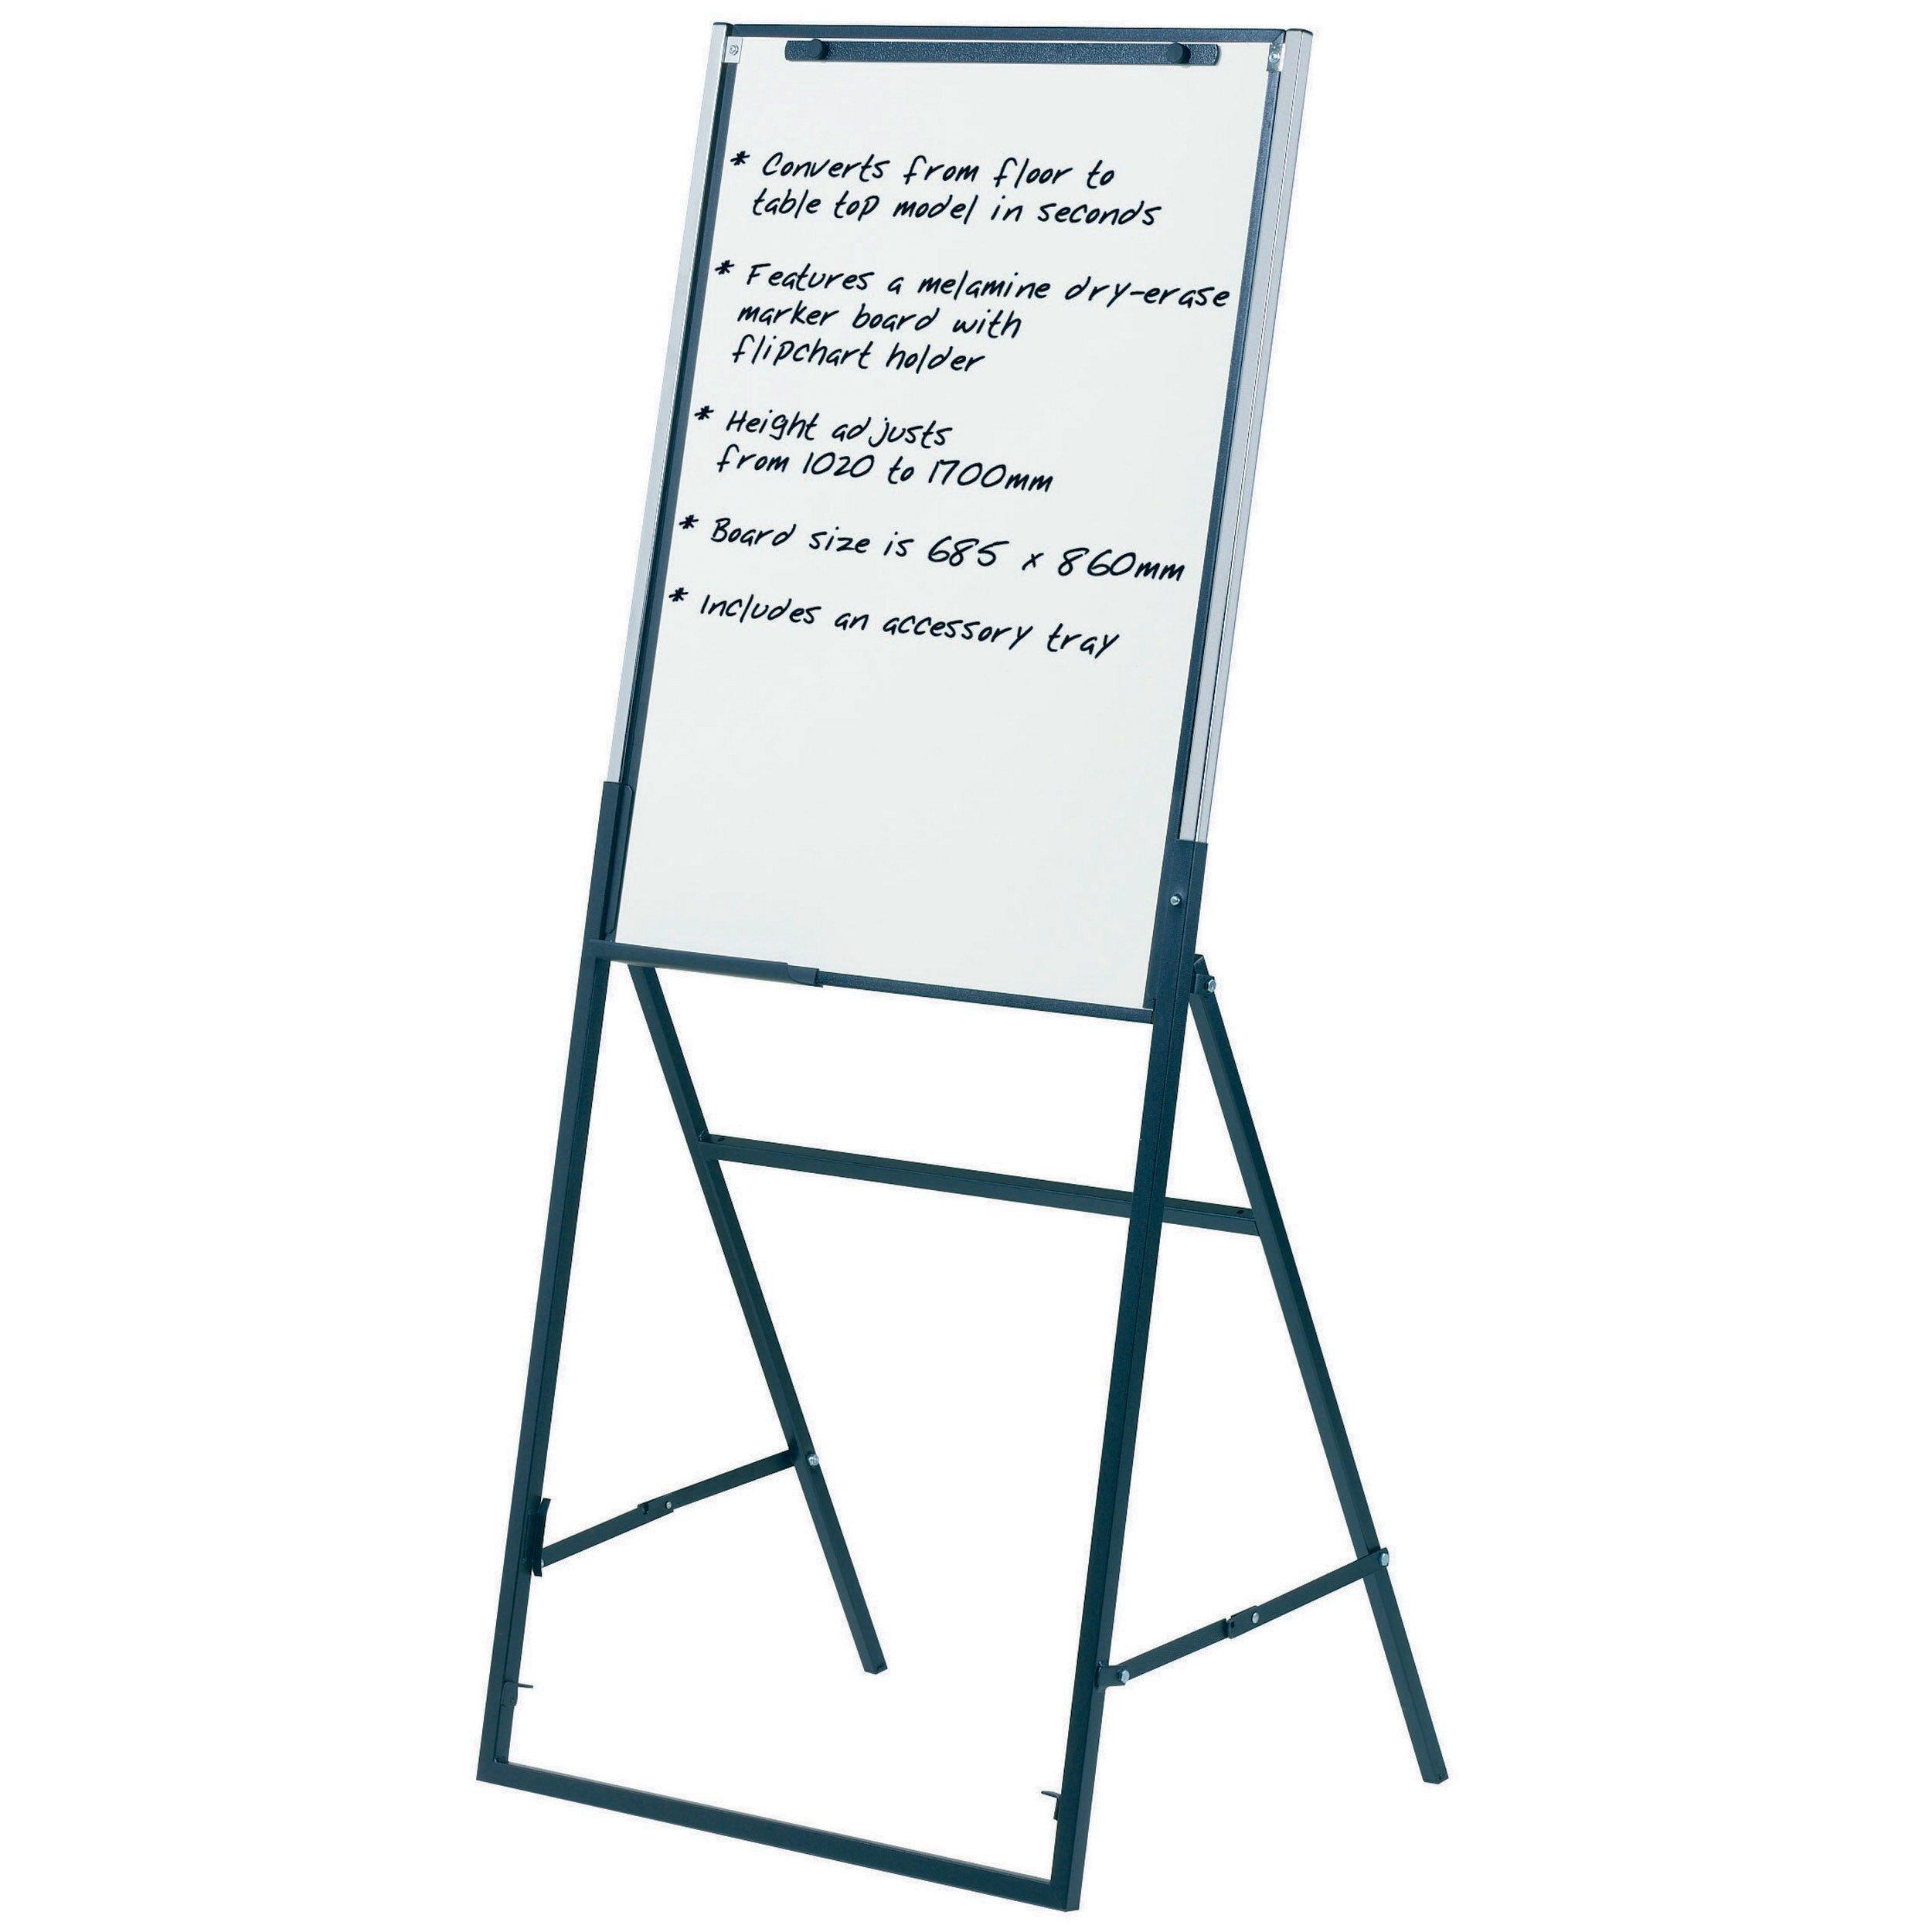 Quartet Futura Easel, Whiteboard/Flipchart, 24 x 36 Inches, Black Frame (351900) by Quartet